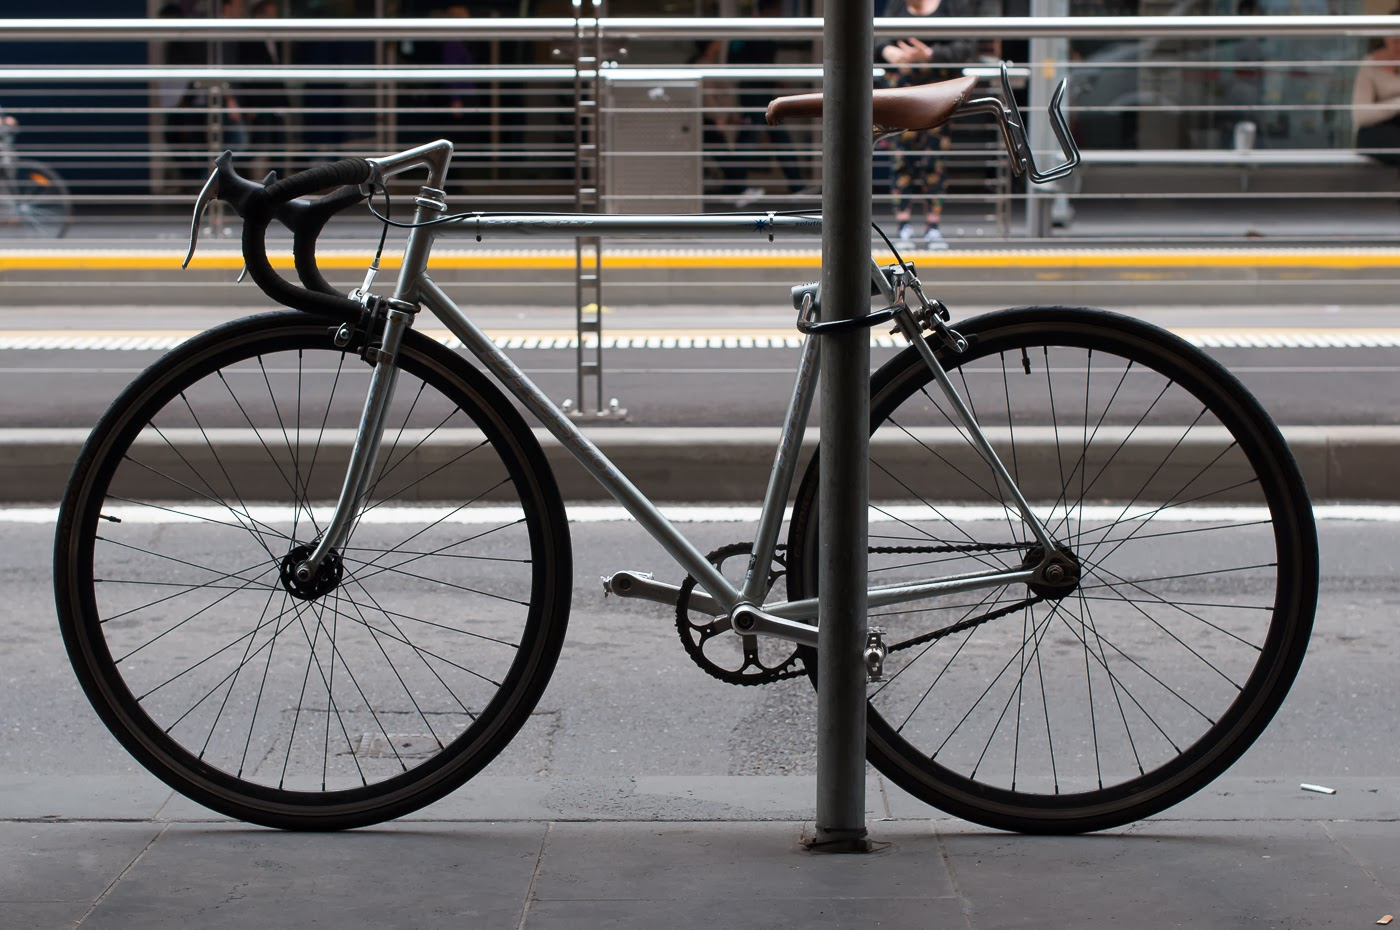 njs, single speed, bike, bicycle, tim macauley, the biketorialist, melbourne, track frame, conversion, presto